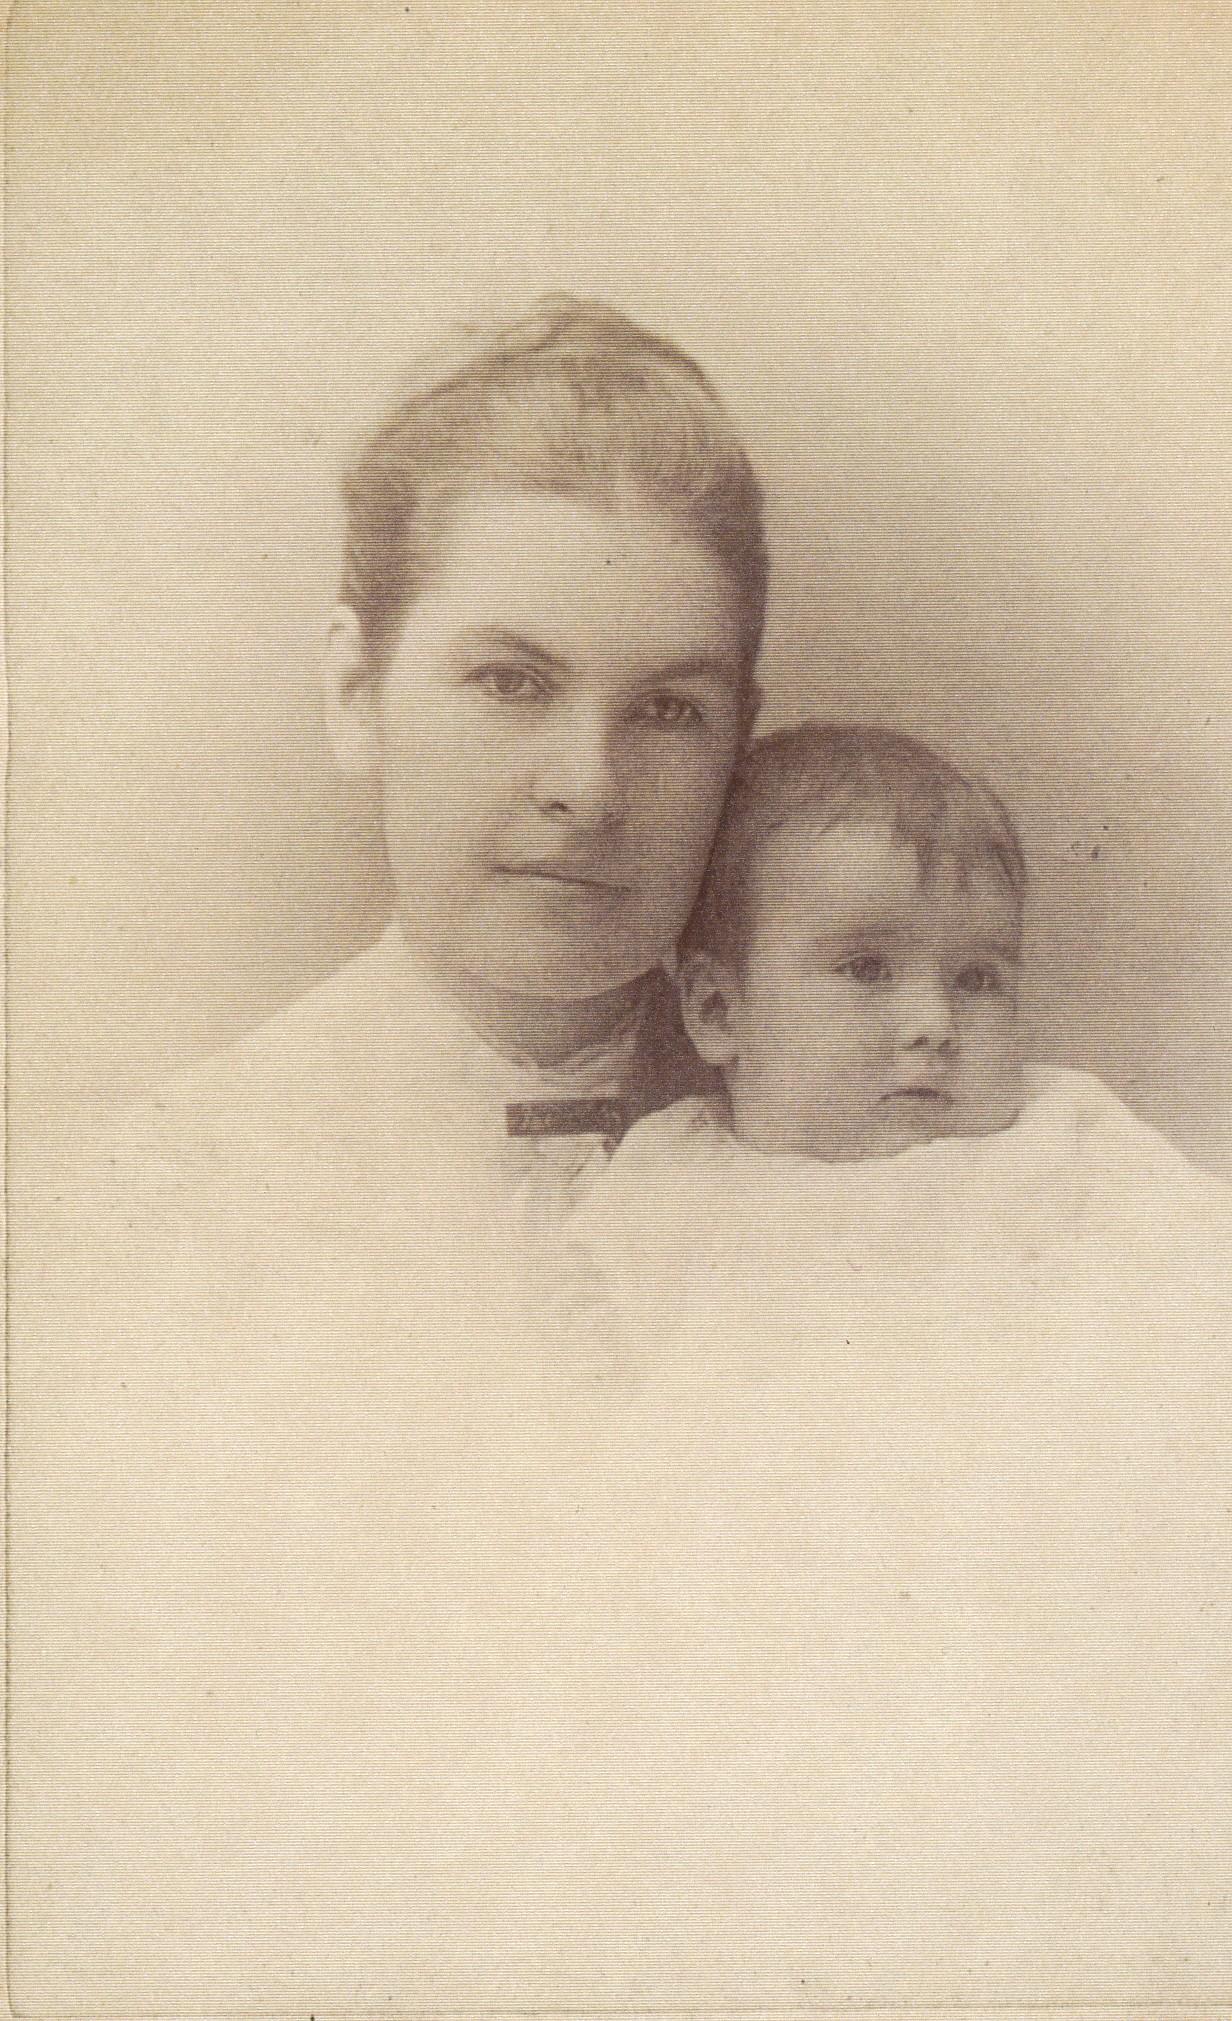 Clara with newborn Marjorie.